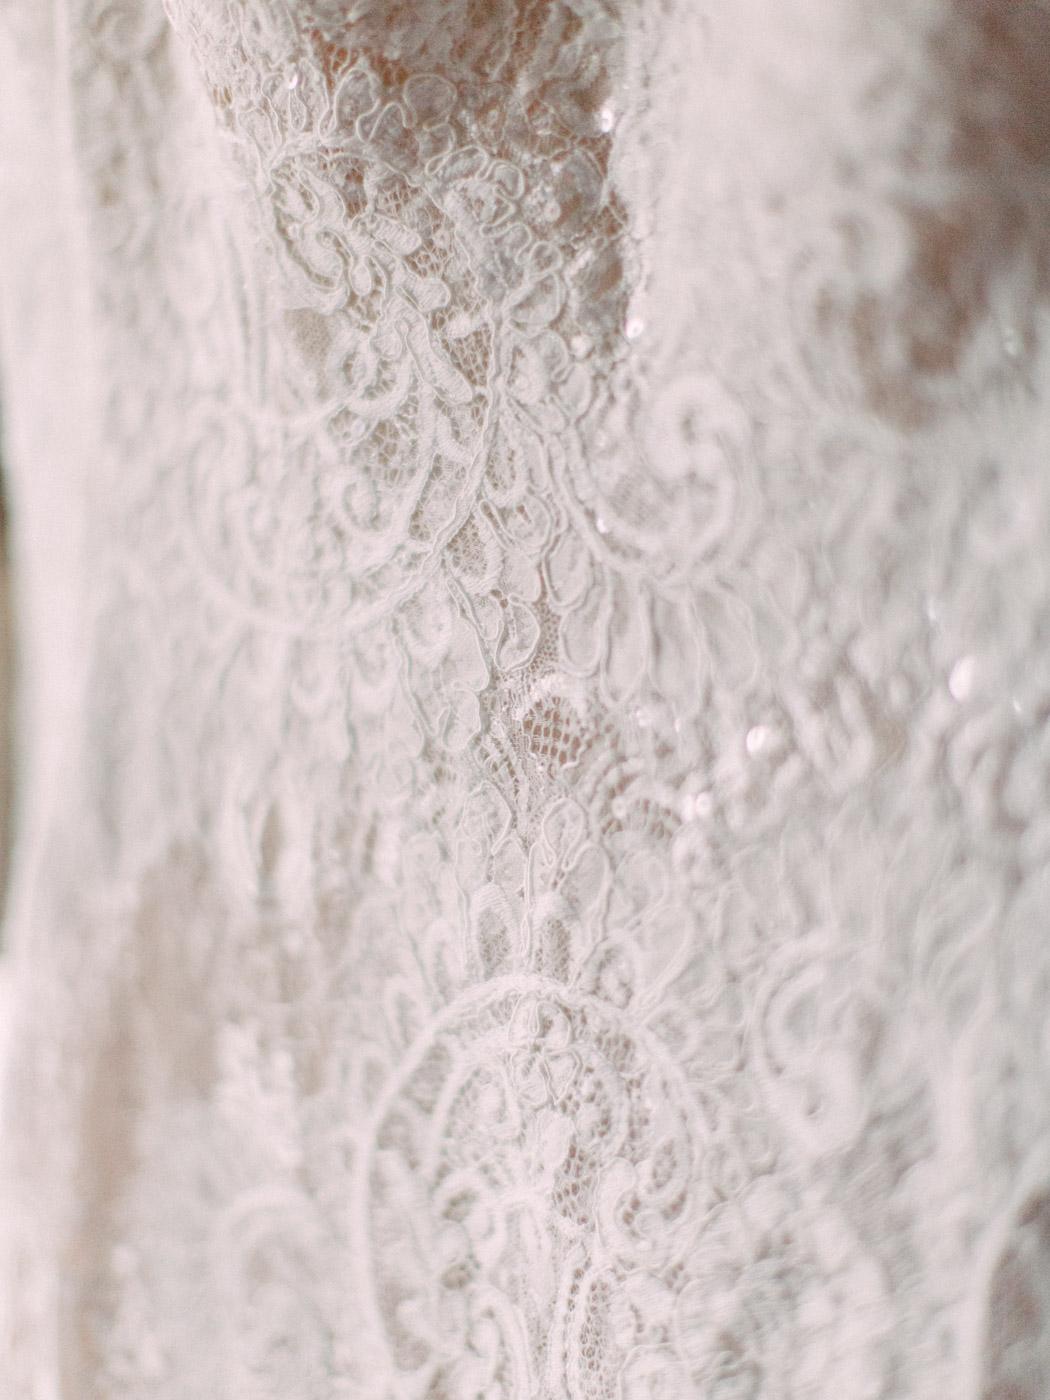 Toronto-wedding-photographer-intimate-classic-fine-art-elopement-ottawa8.jpg